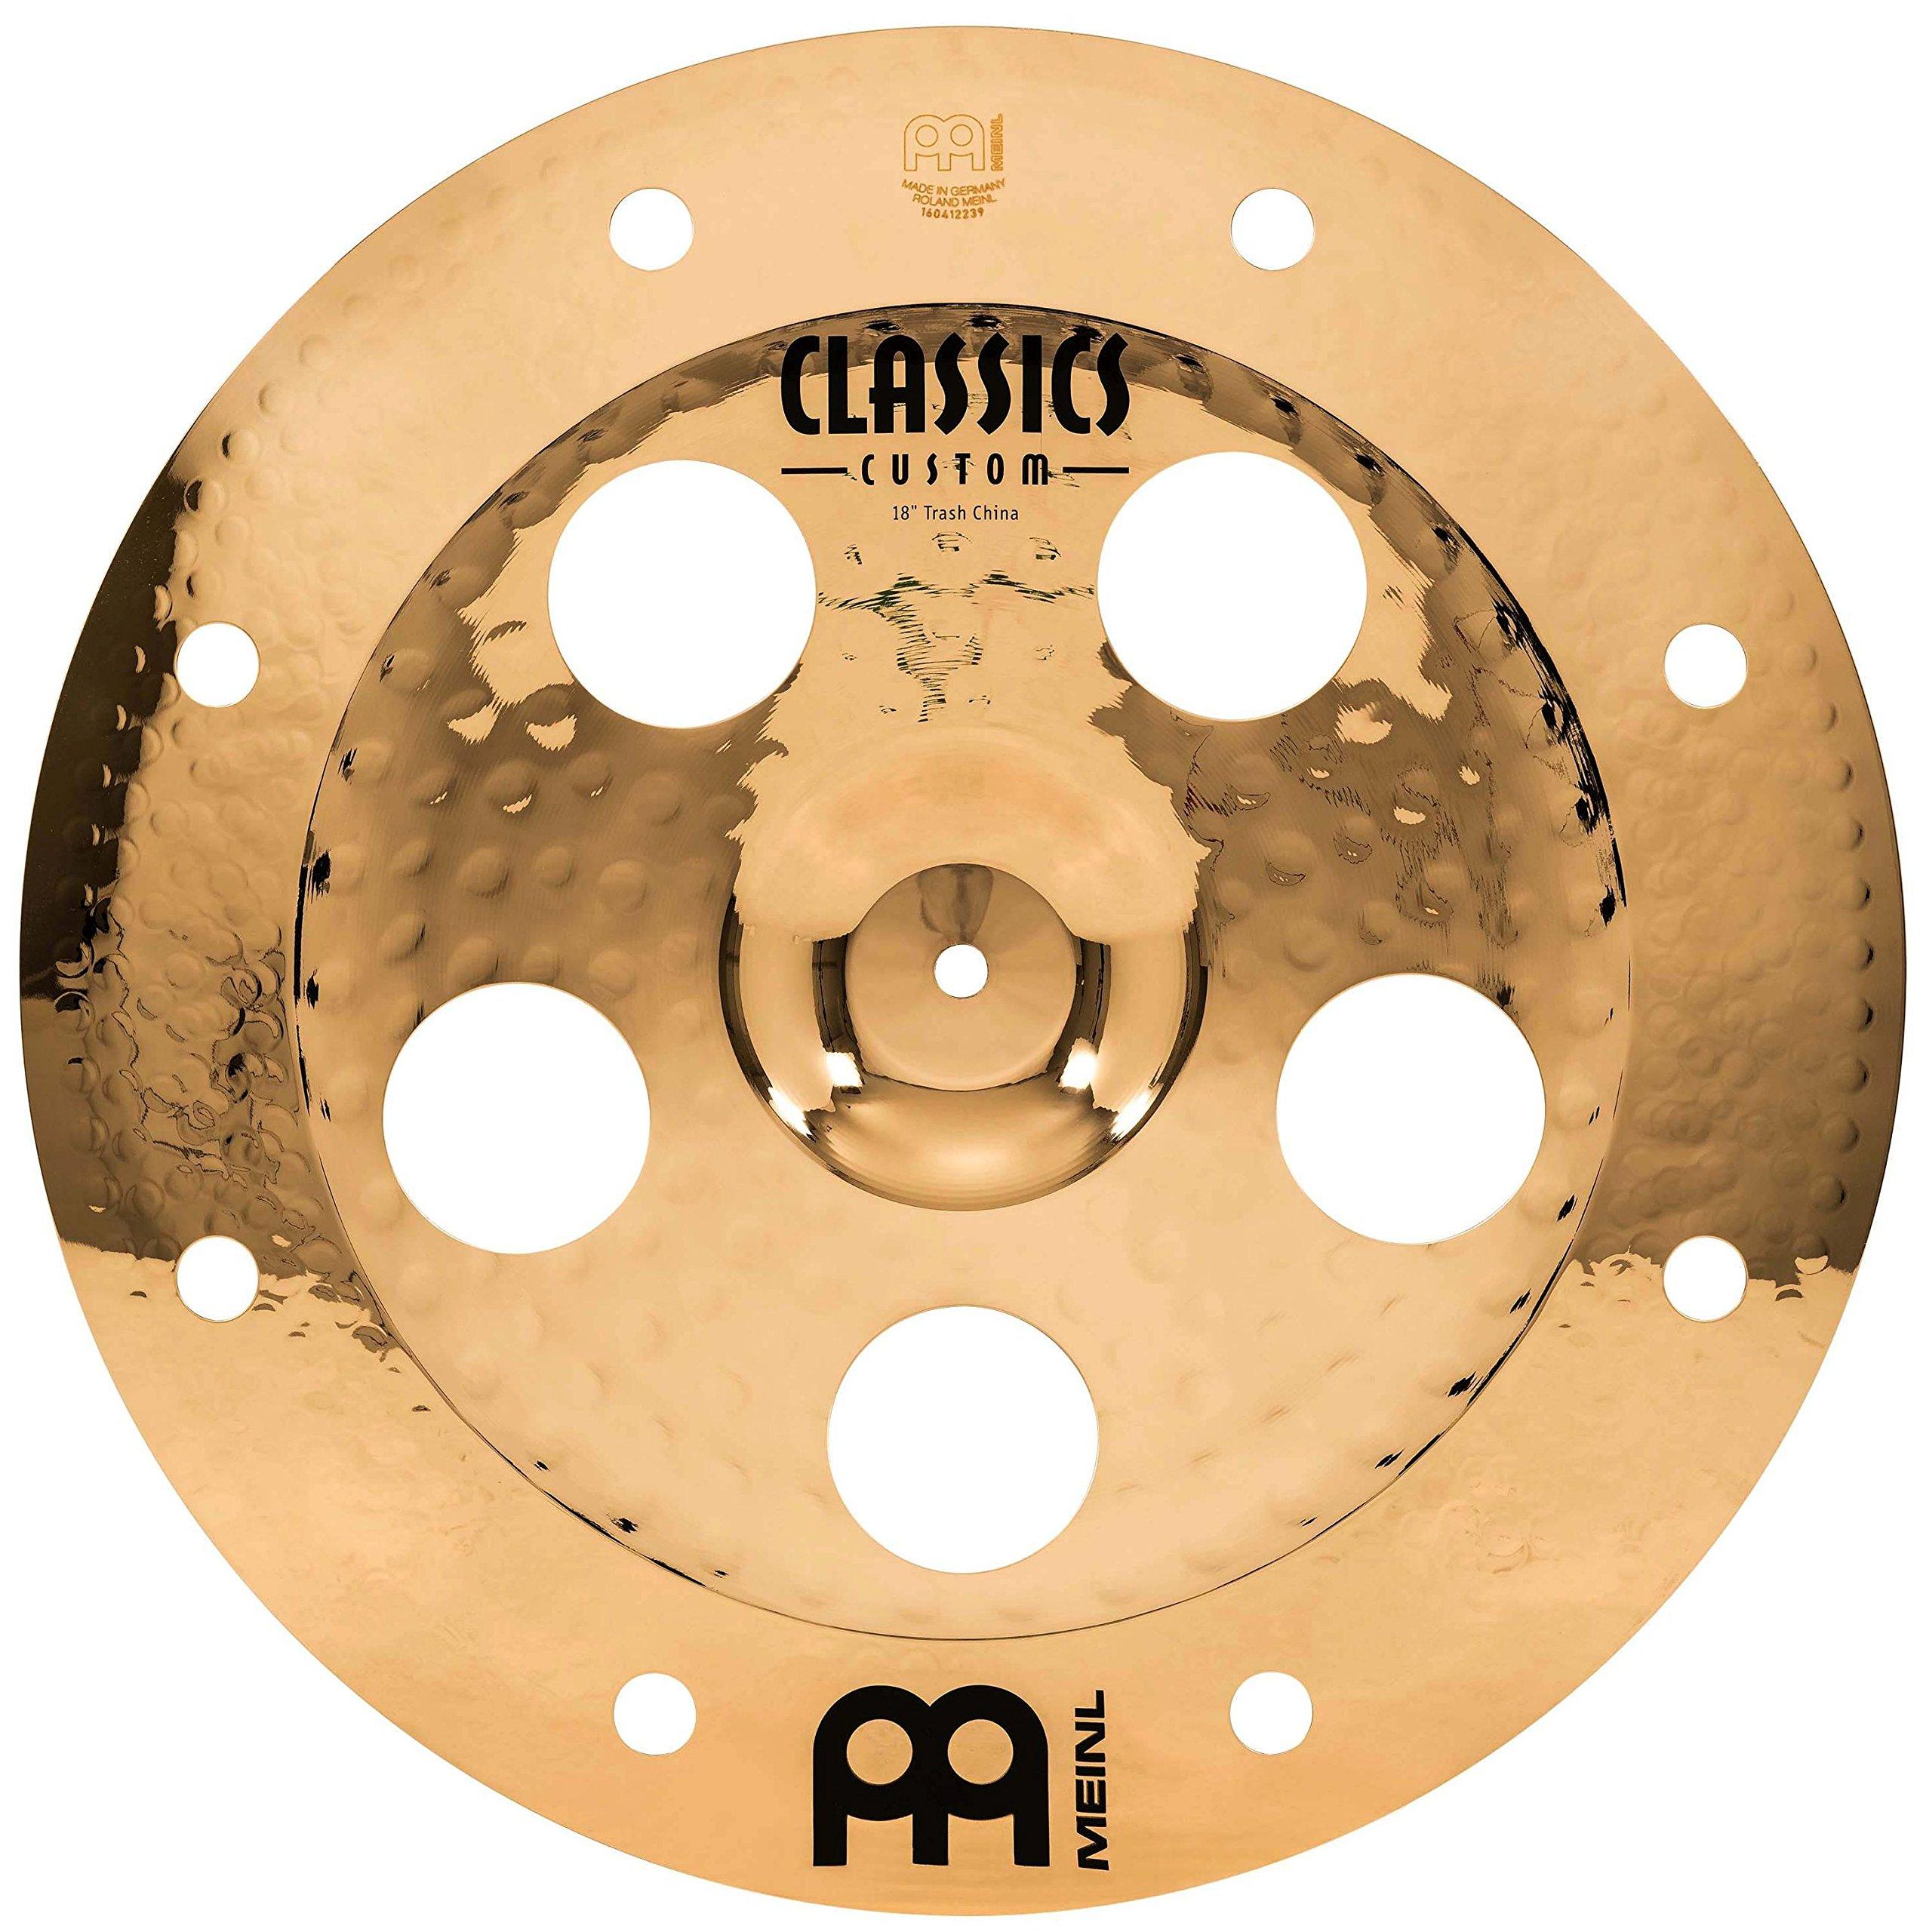 Meinl 18'' Trash China Cymbal with Holes - Classics Custom Brilliant - Made In Germany, 2-YEAR WARRANTY (CC18TRCH-B)